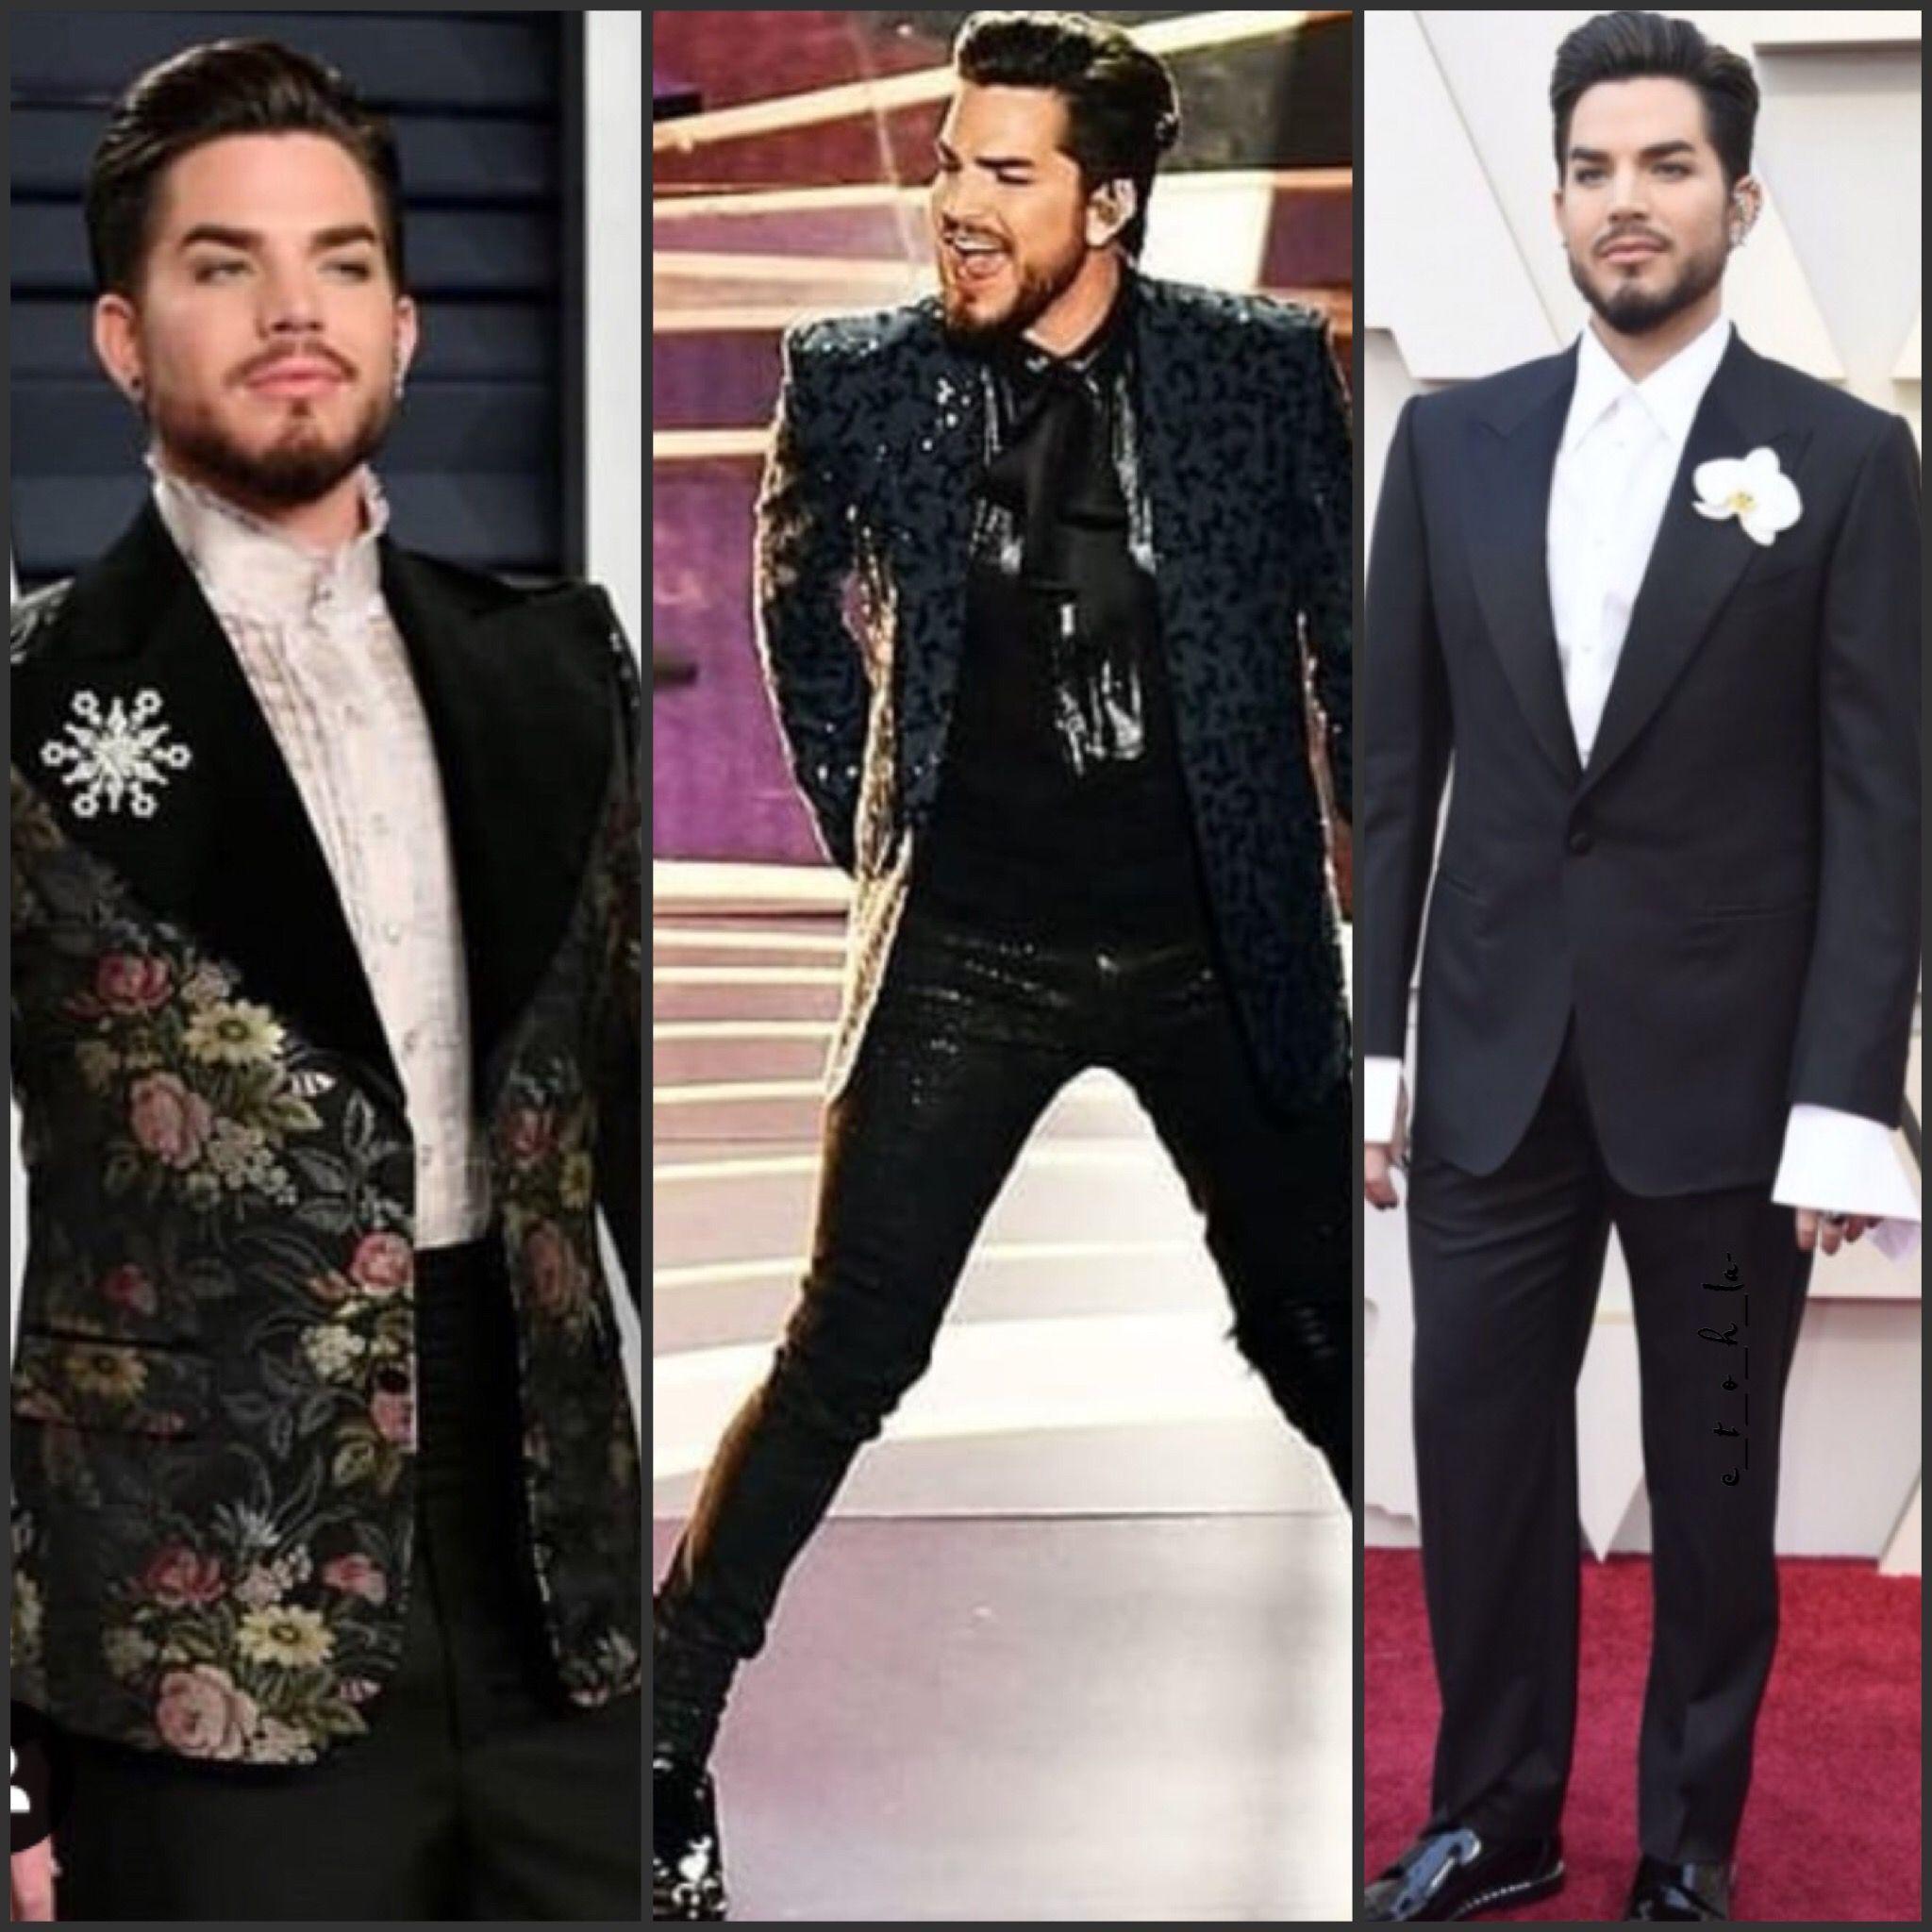 2019 02 24 Adam Lambert Oscars 1 Oscar Party 2 Opening The Oscars W Queen 3 Red Carpet